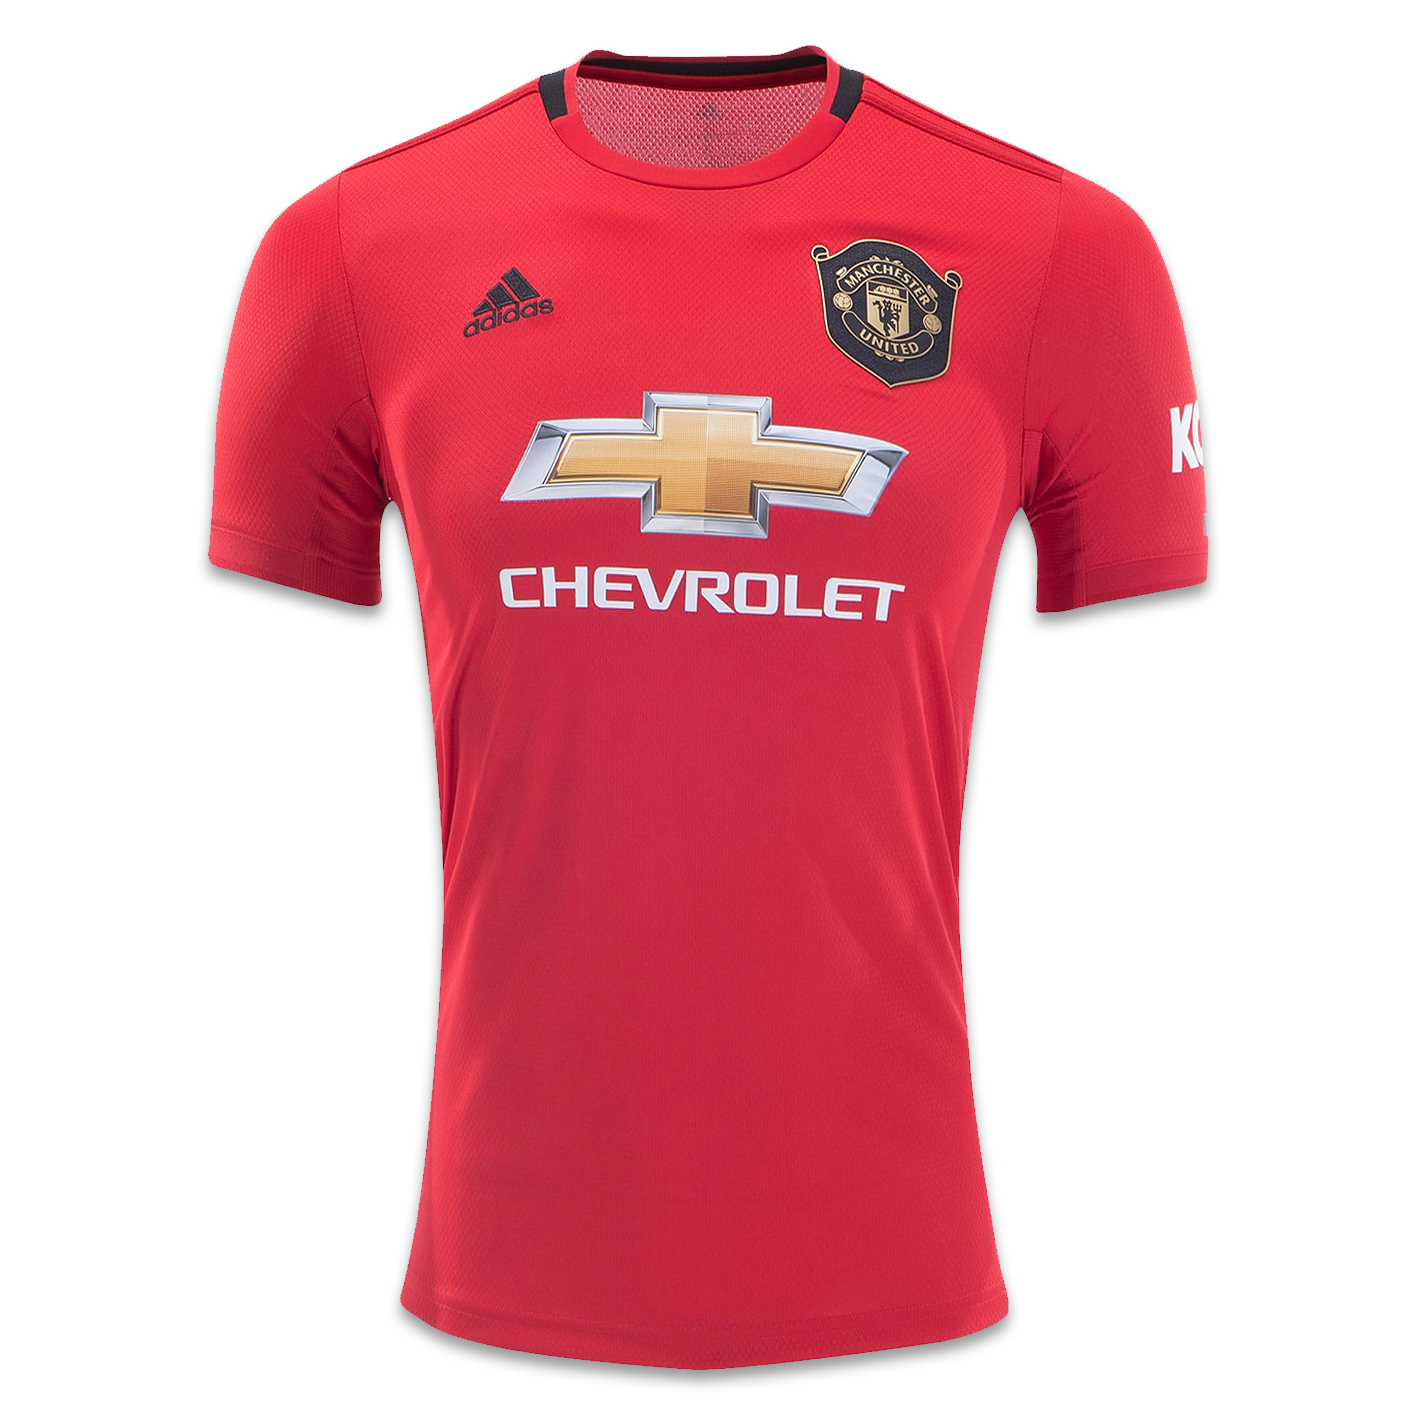 Club Soccer Jerseys 2019 20 Soccer Jersey Official Kits New Football Kits 2019 20 Tottenham 2019 20 Kit 2019 Manchester United Football Shirts Soccer Jersey